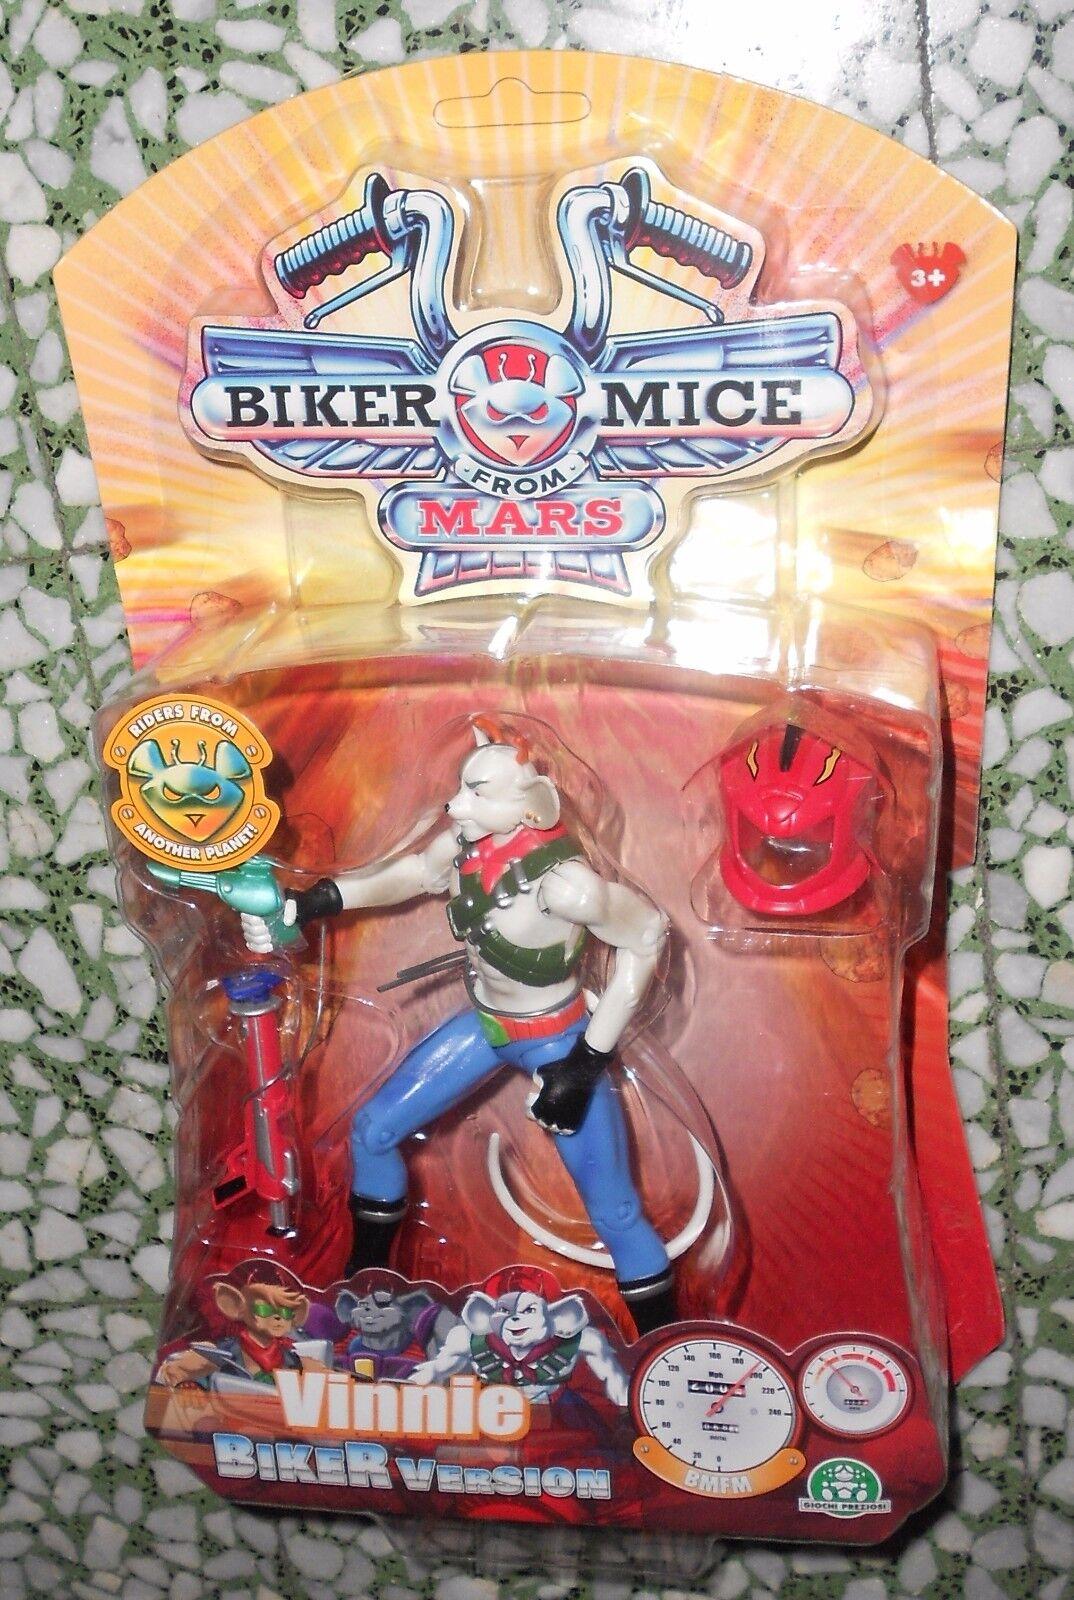 ACTION FIGURE Biker Mice Mice Mice from Mars VINNIE - MISB MOC 1d0159